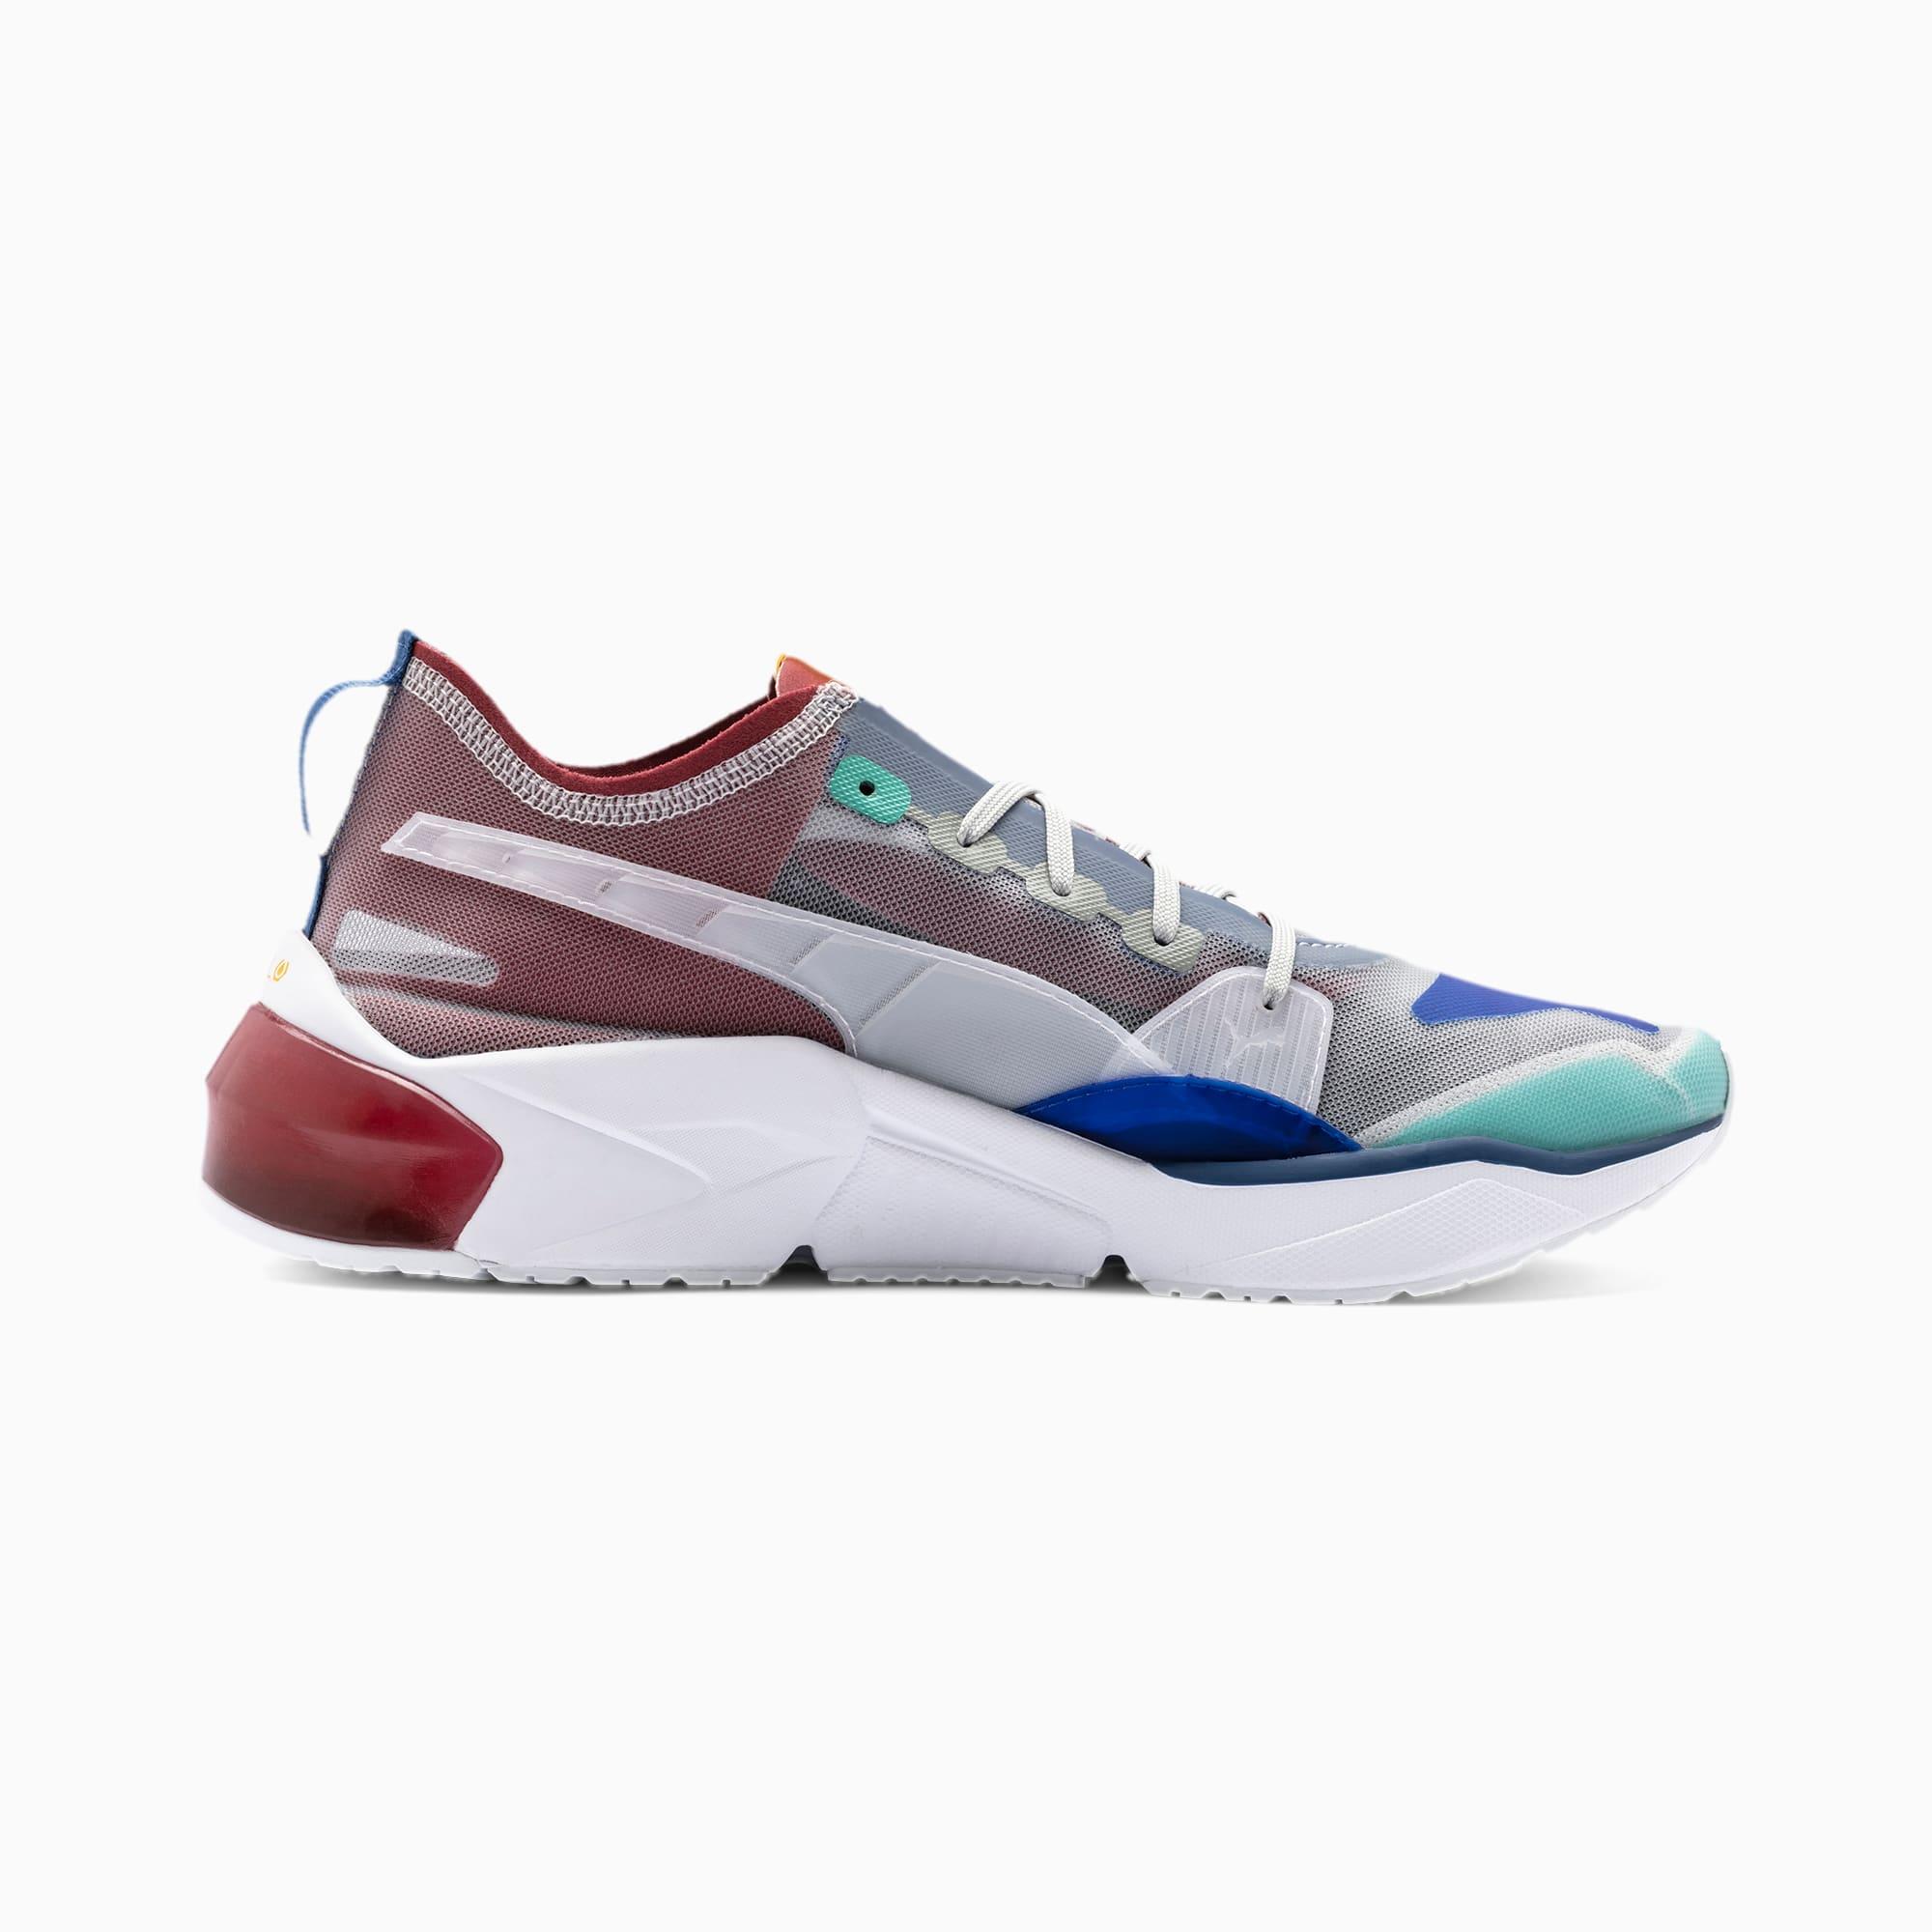 Chaussures d'entraînement PUMA x FIRST MILE LQDCELL Optic, homme